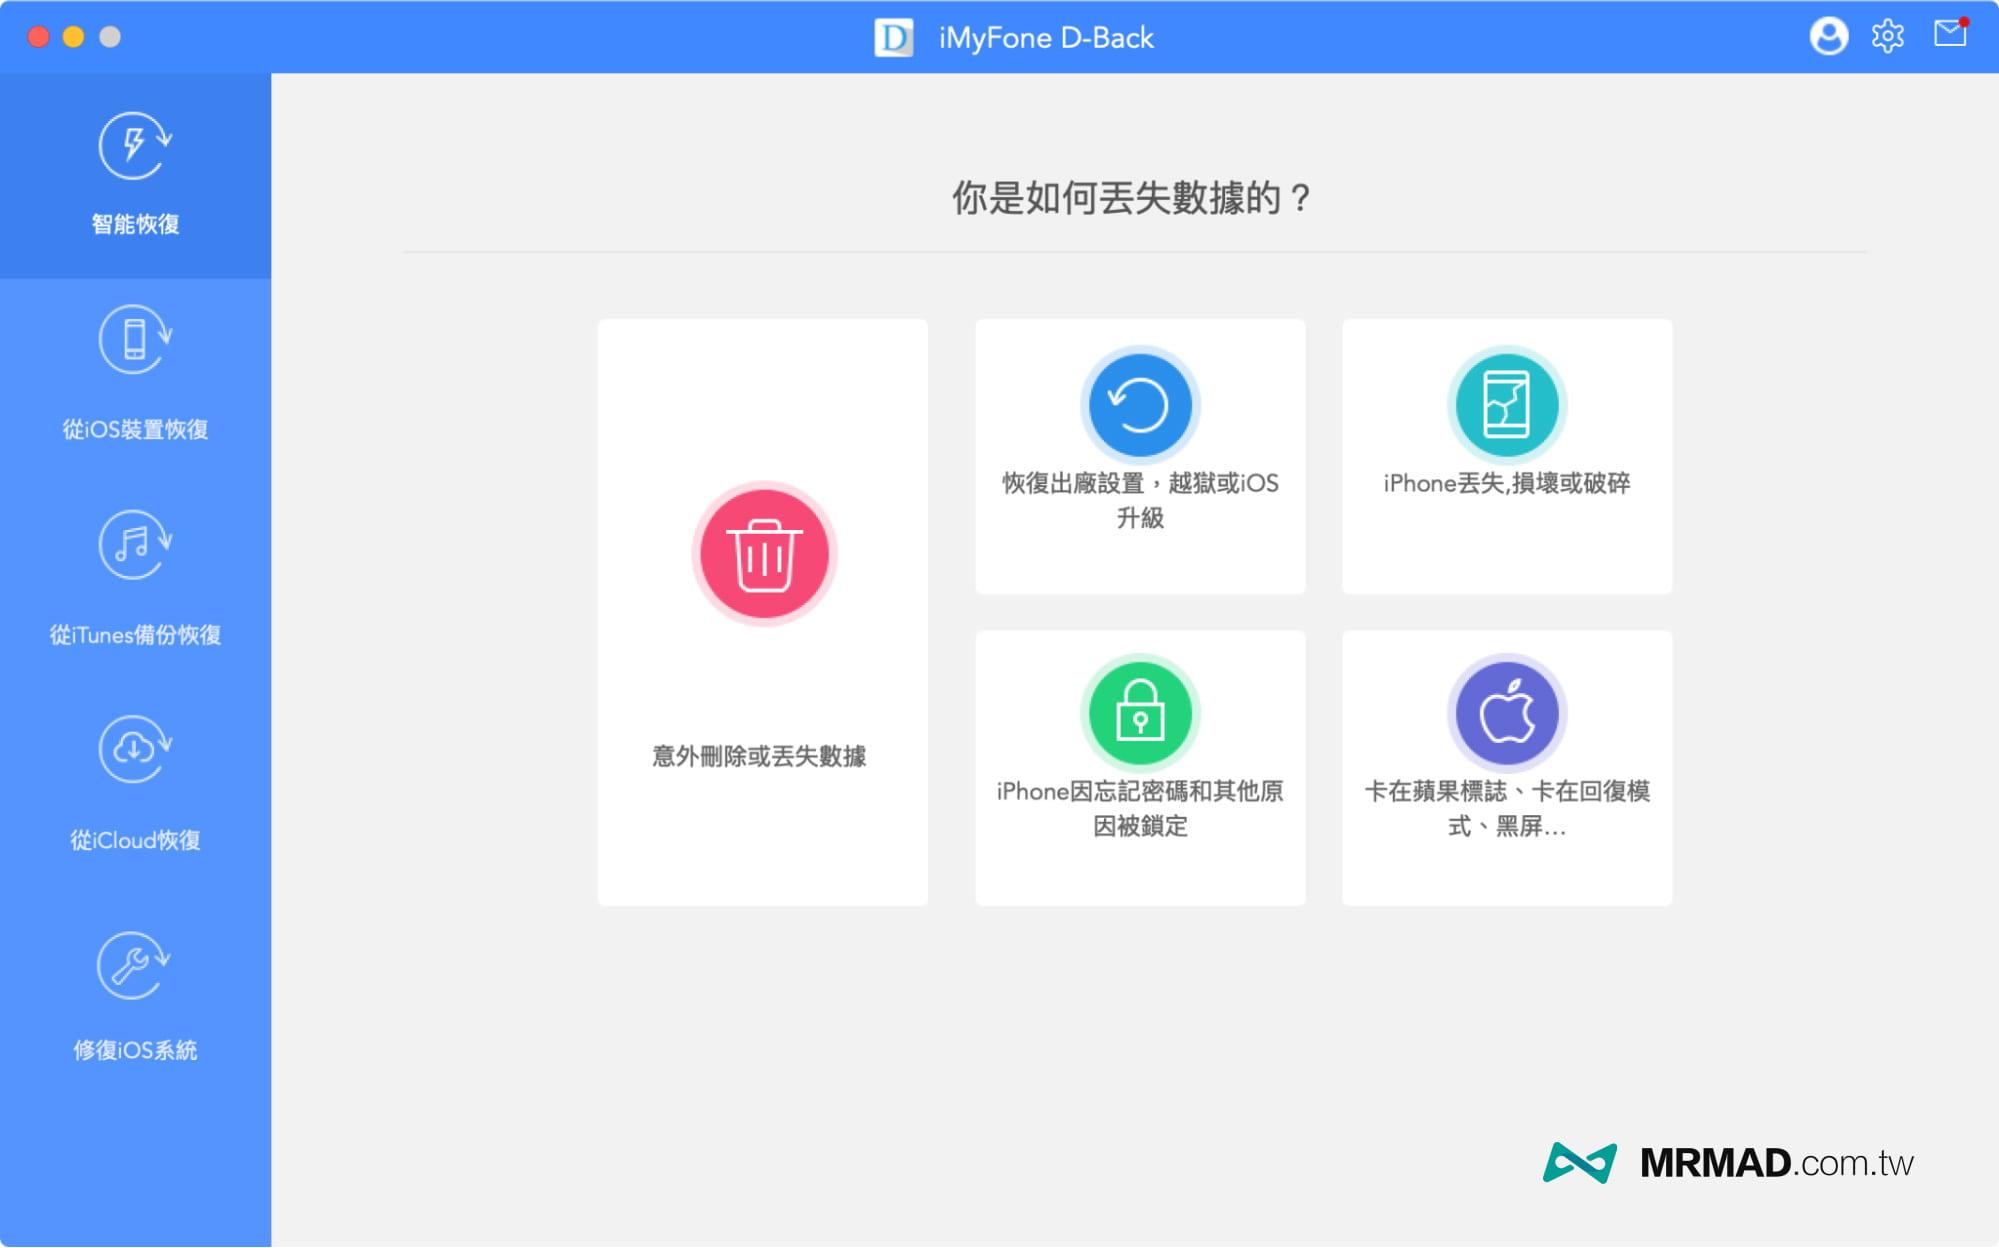 iMyFone D-Back iPhone/iPad檔案救援全面解析